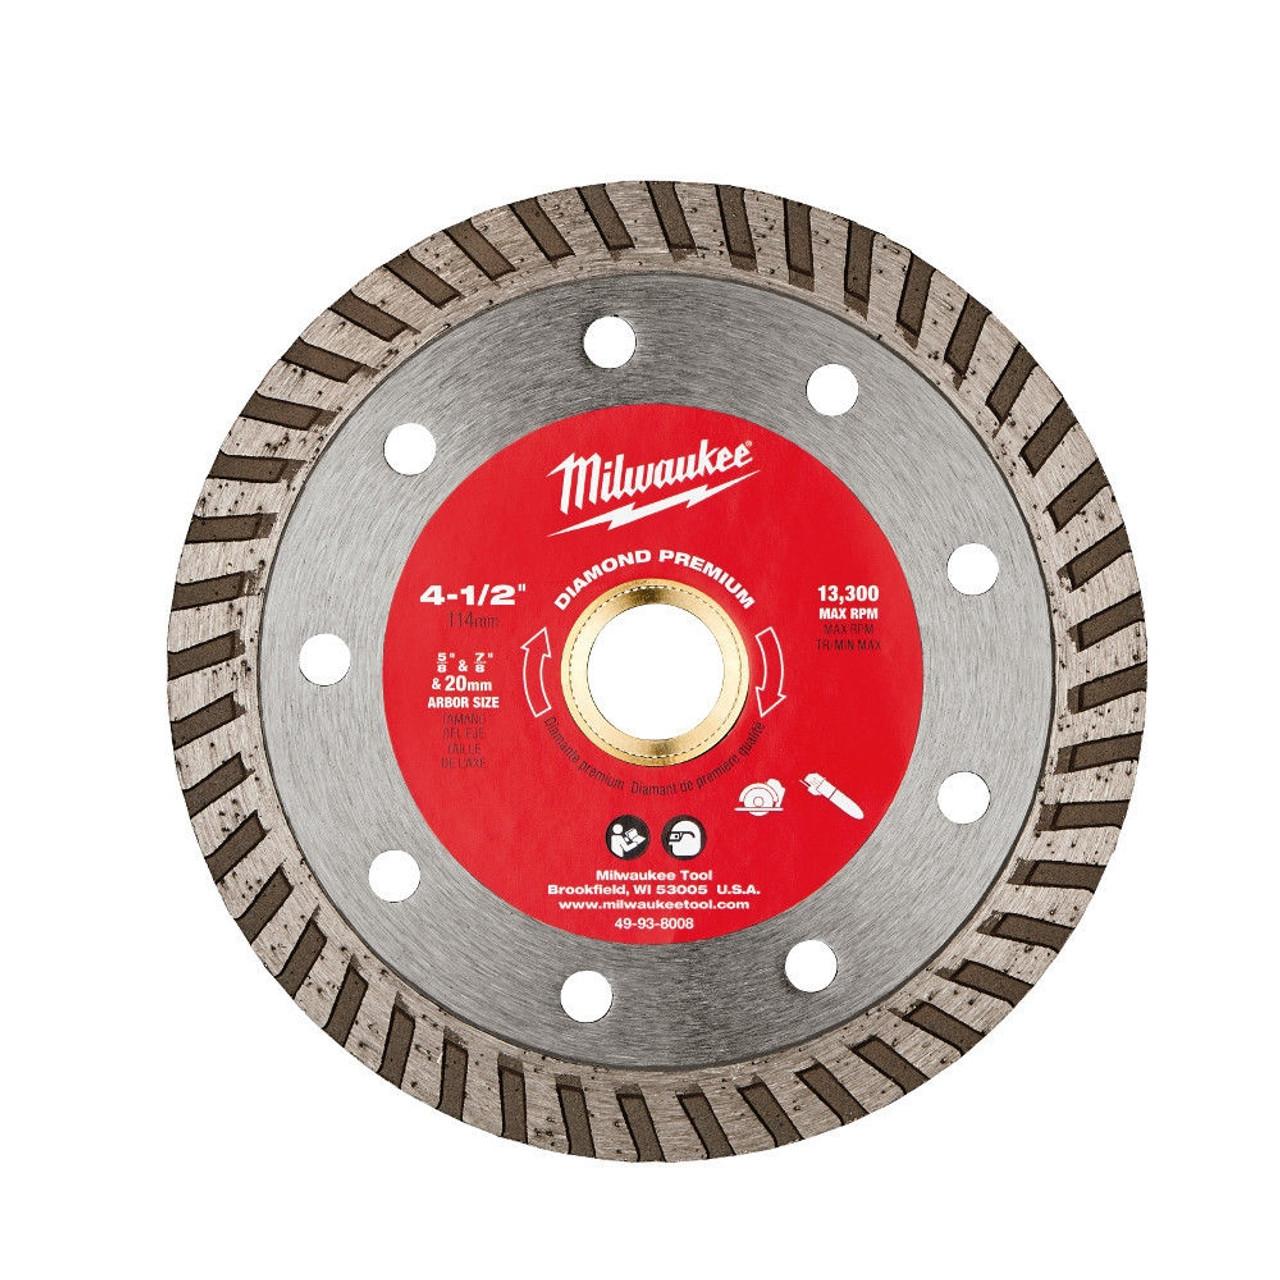 Milwaukee 49-93-8008 4-1/2 in. Diamond Premium Turbo Saw Blade